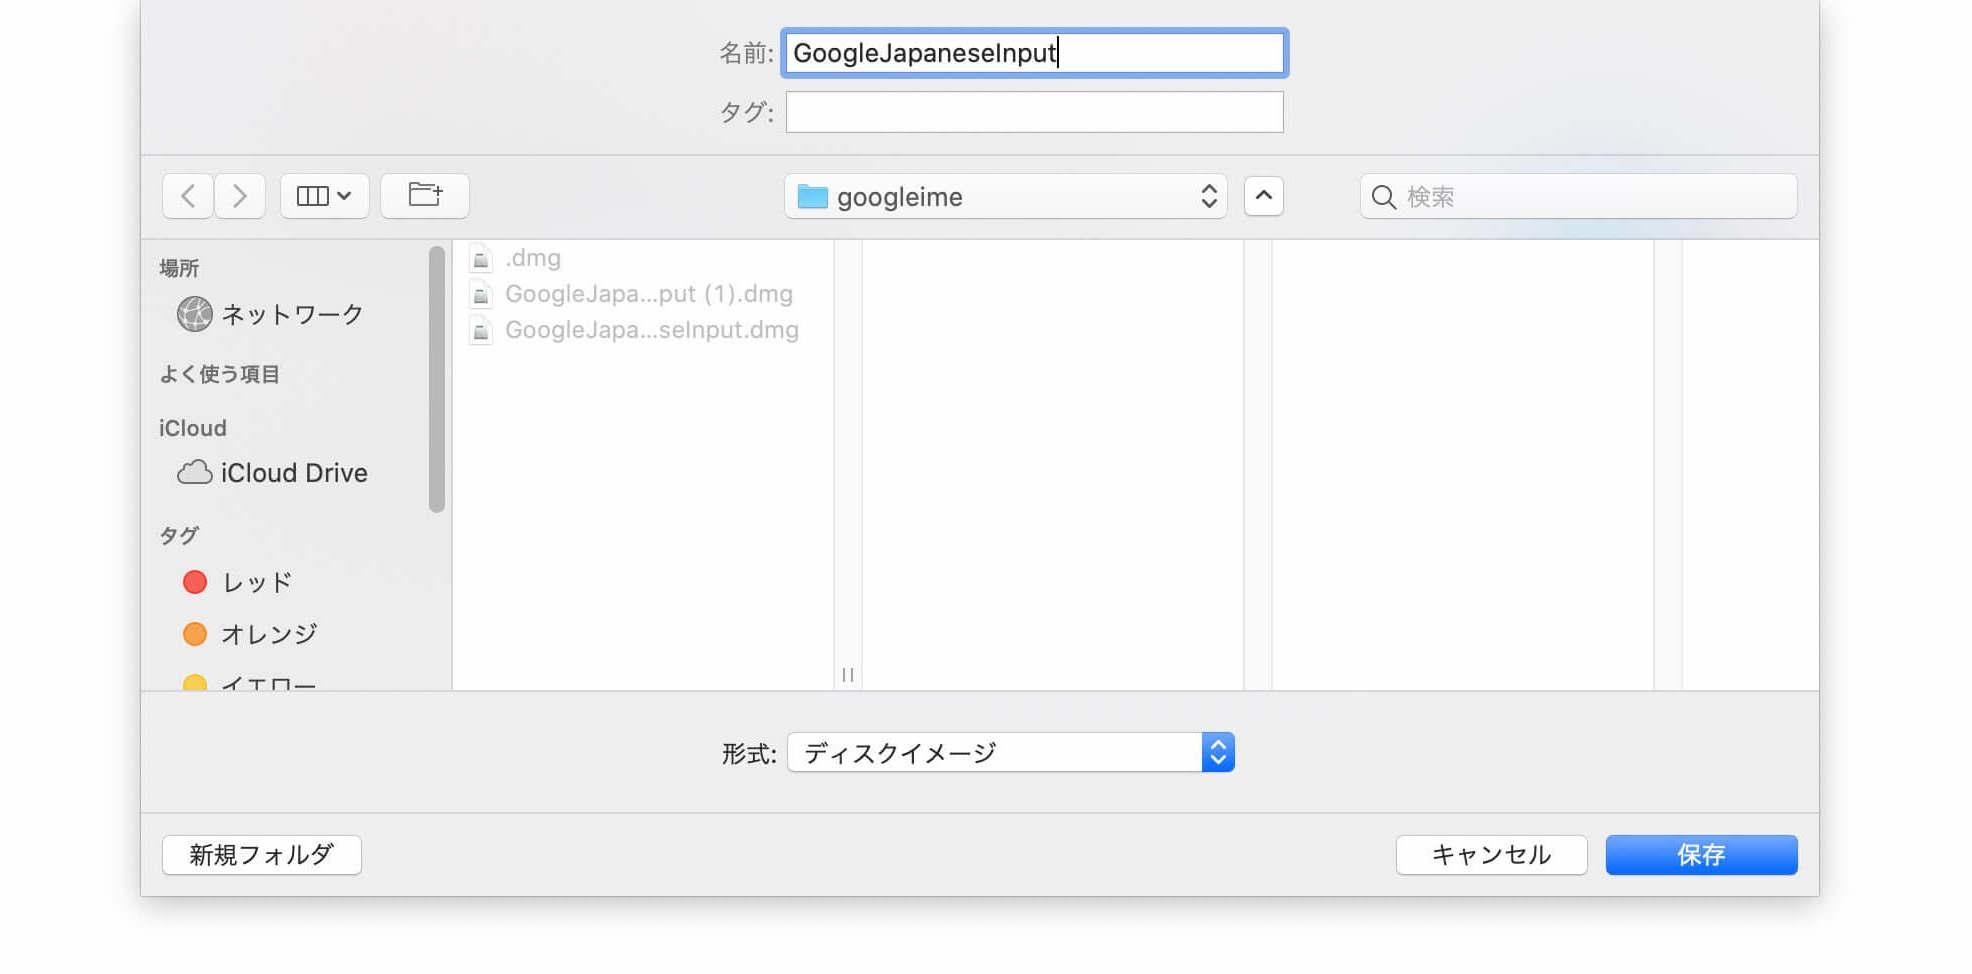 MacでGoogle日本語入力のインストールや設定をする方法【Mac|IME|変換|Mac便利術】 Mac